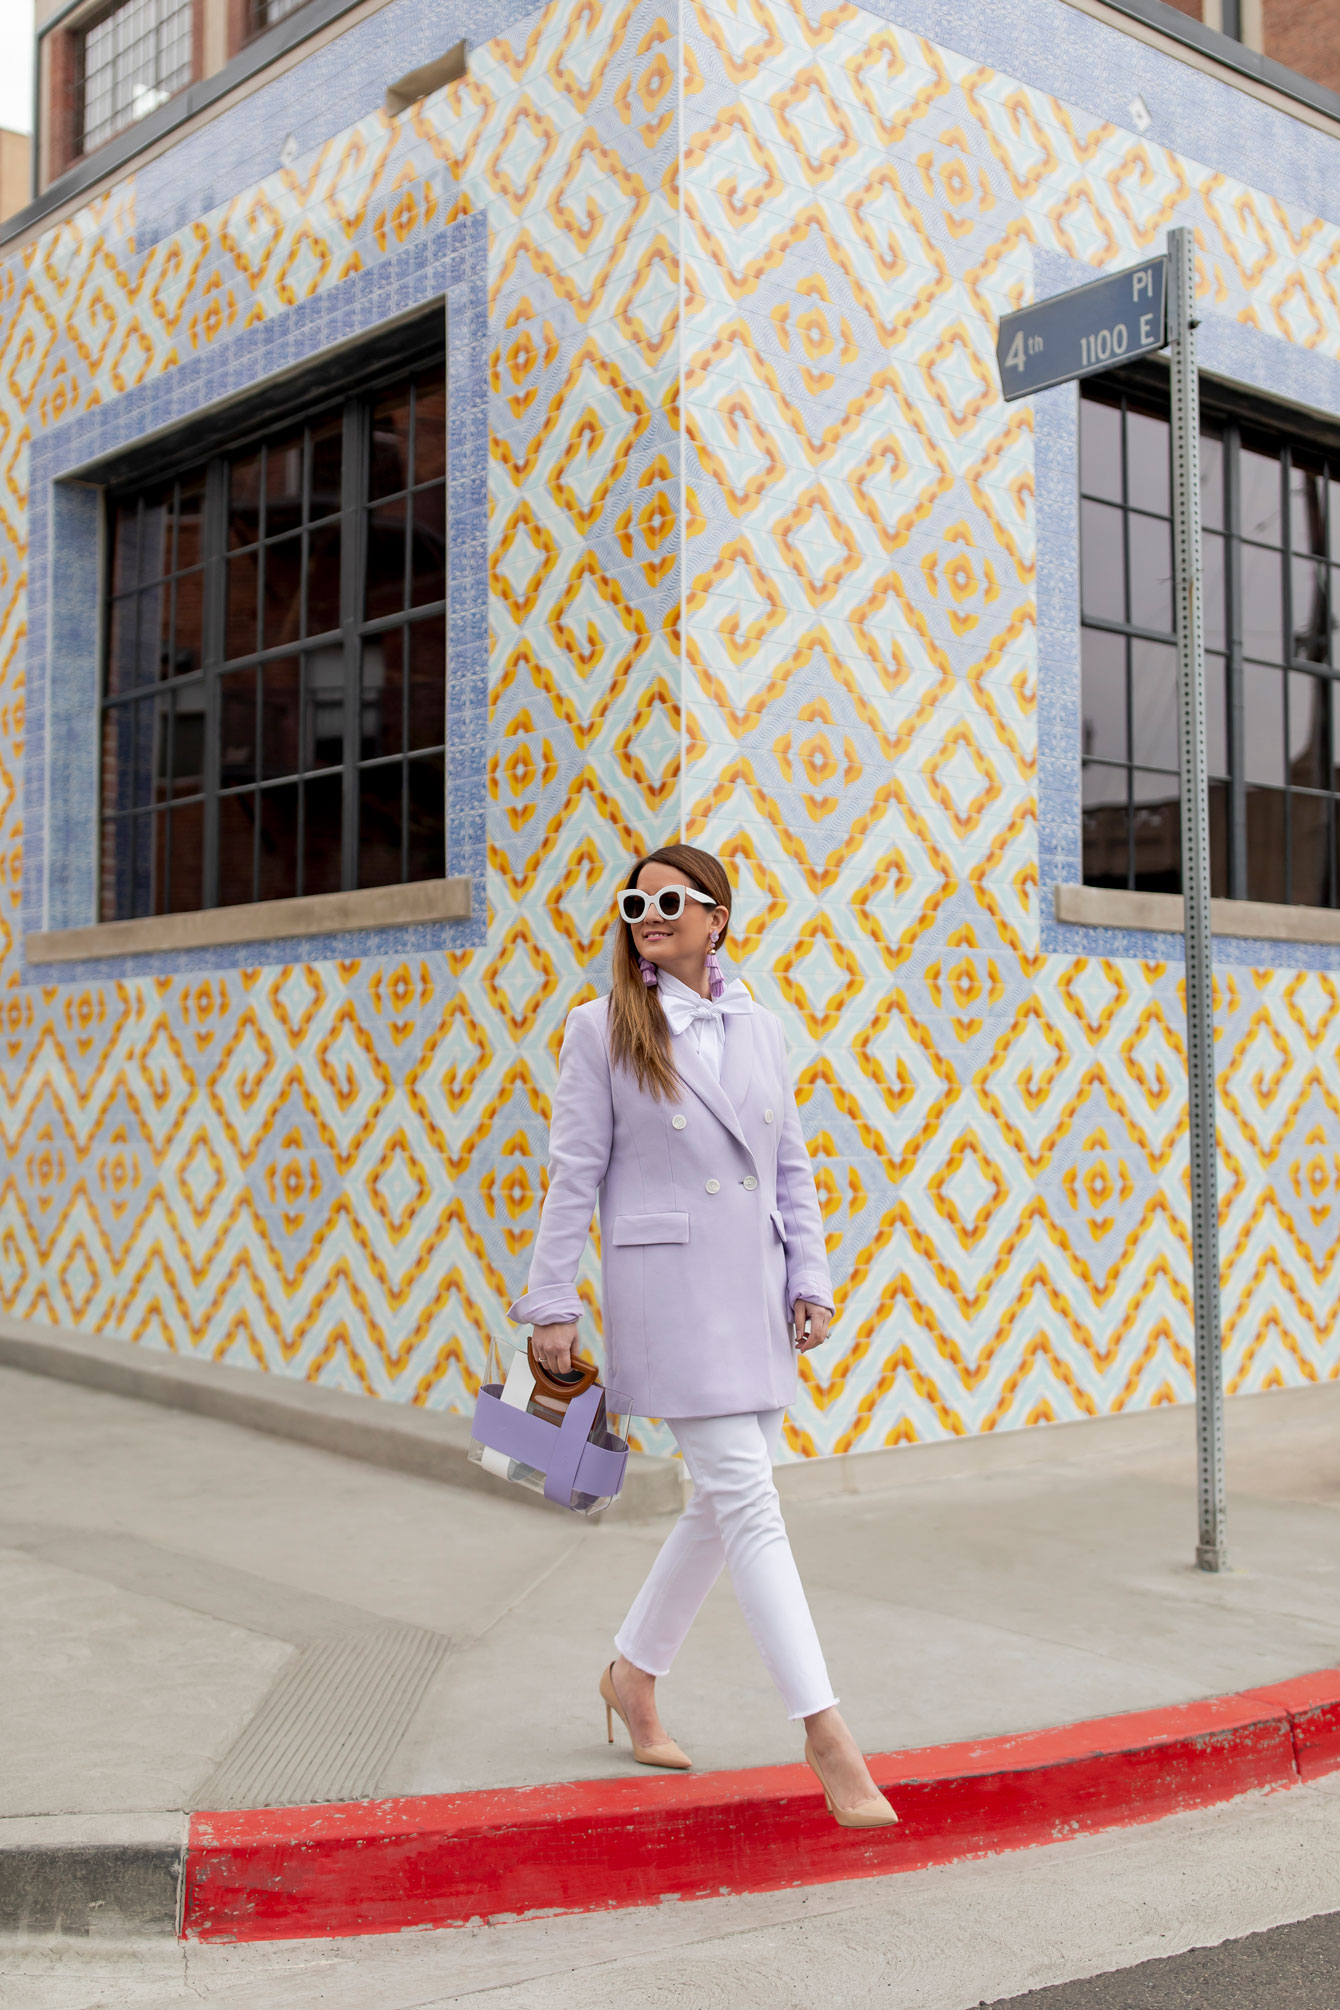 Colorful Tile Building Los Angeles